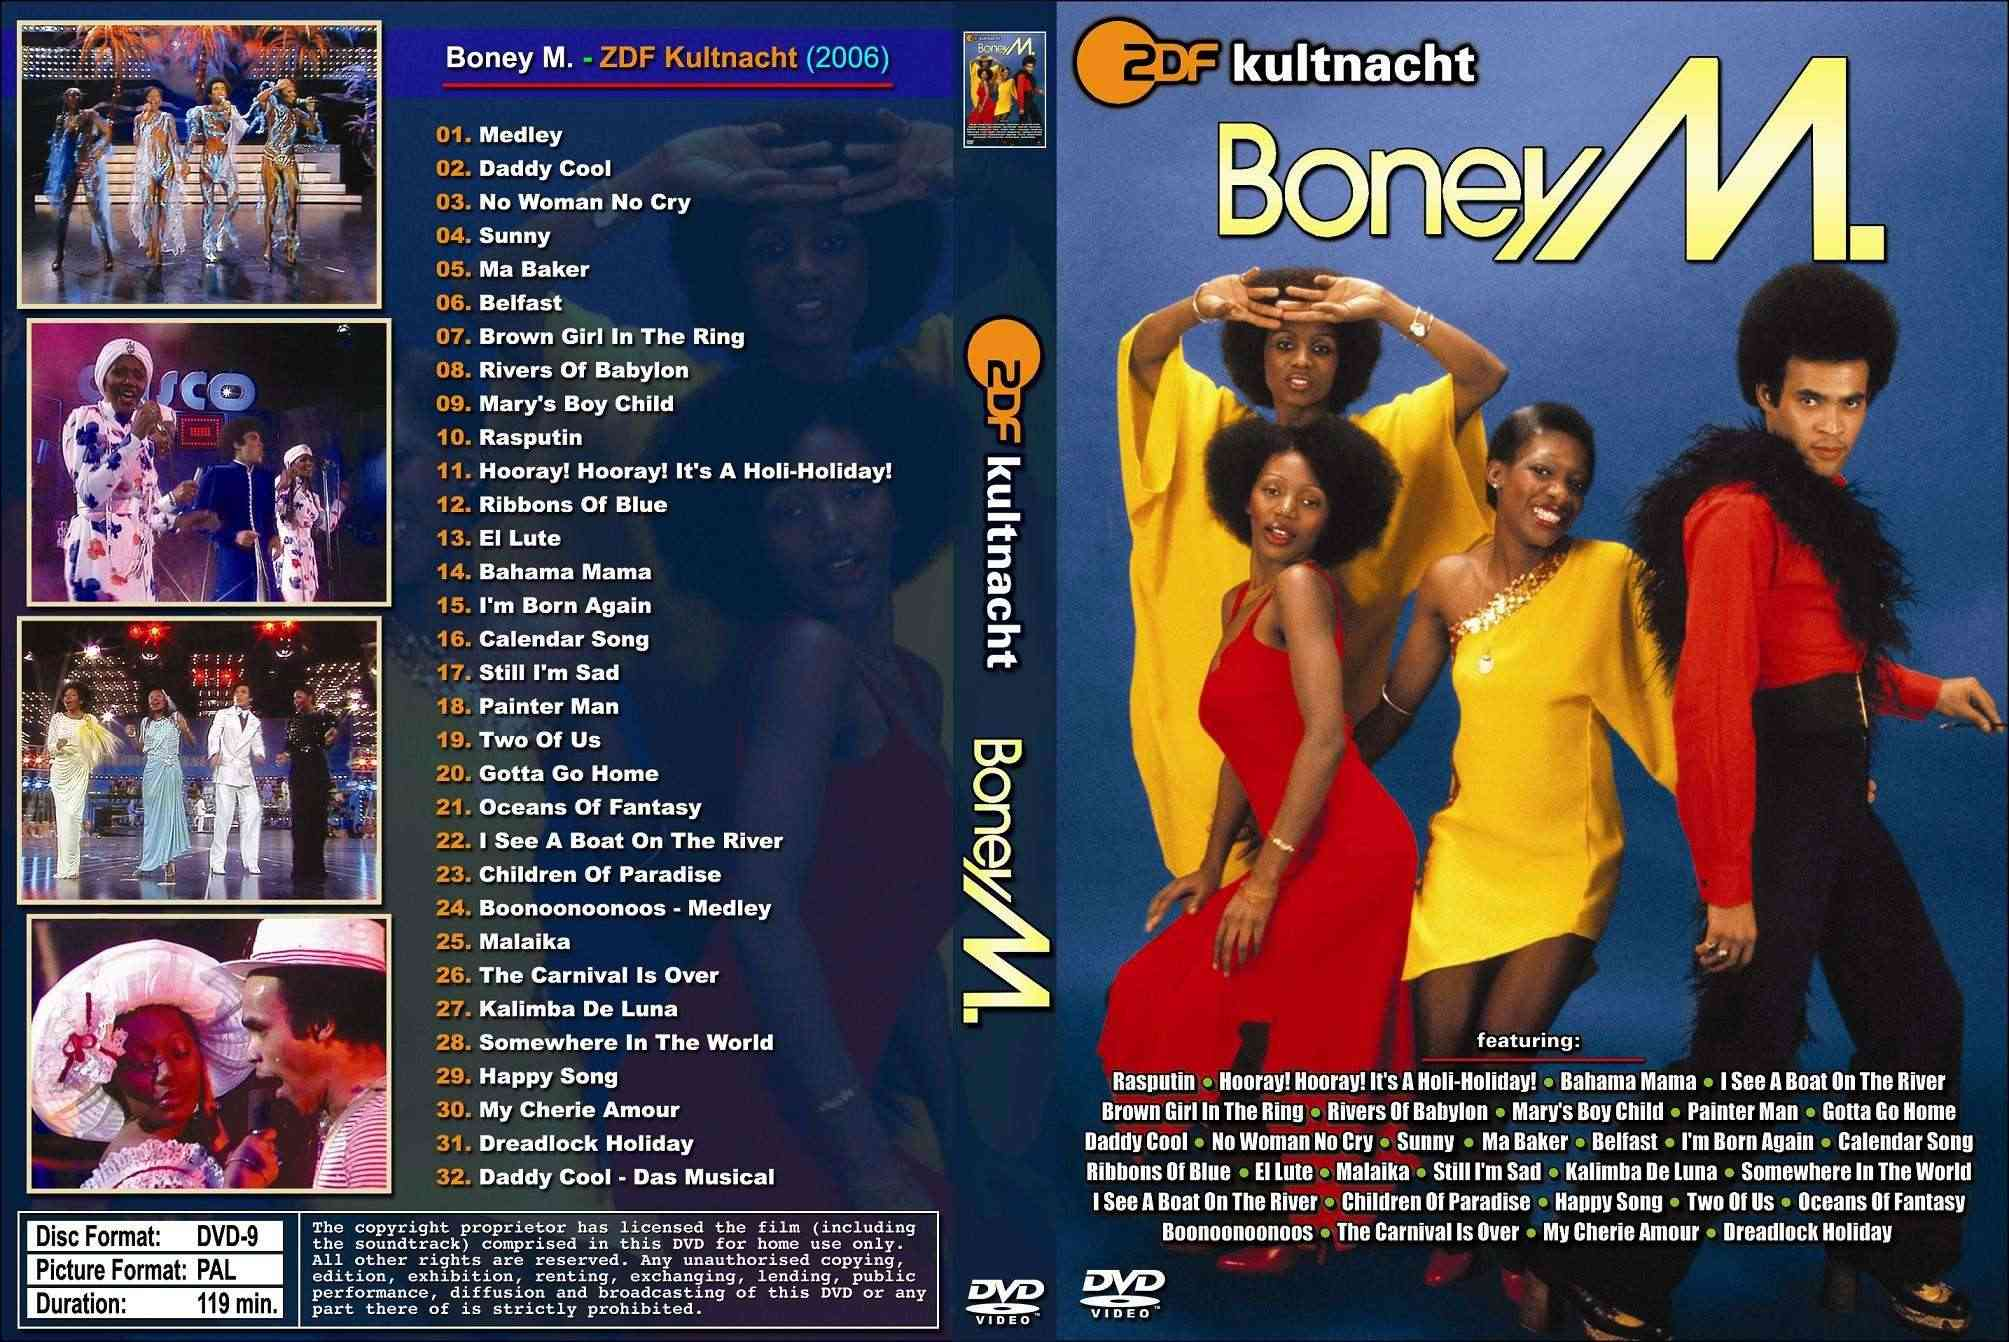 Boney M. - ZDF Kultnacht - 2DVD (2006) Boney M. - ZDF Kultnacht - Satrip